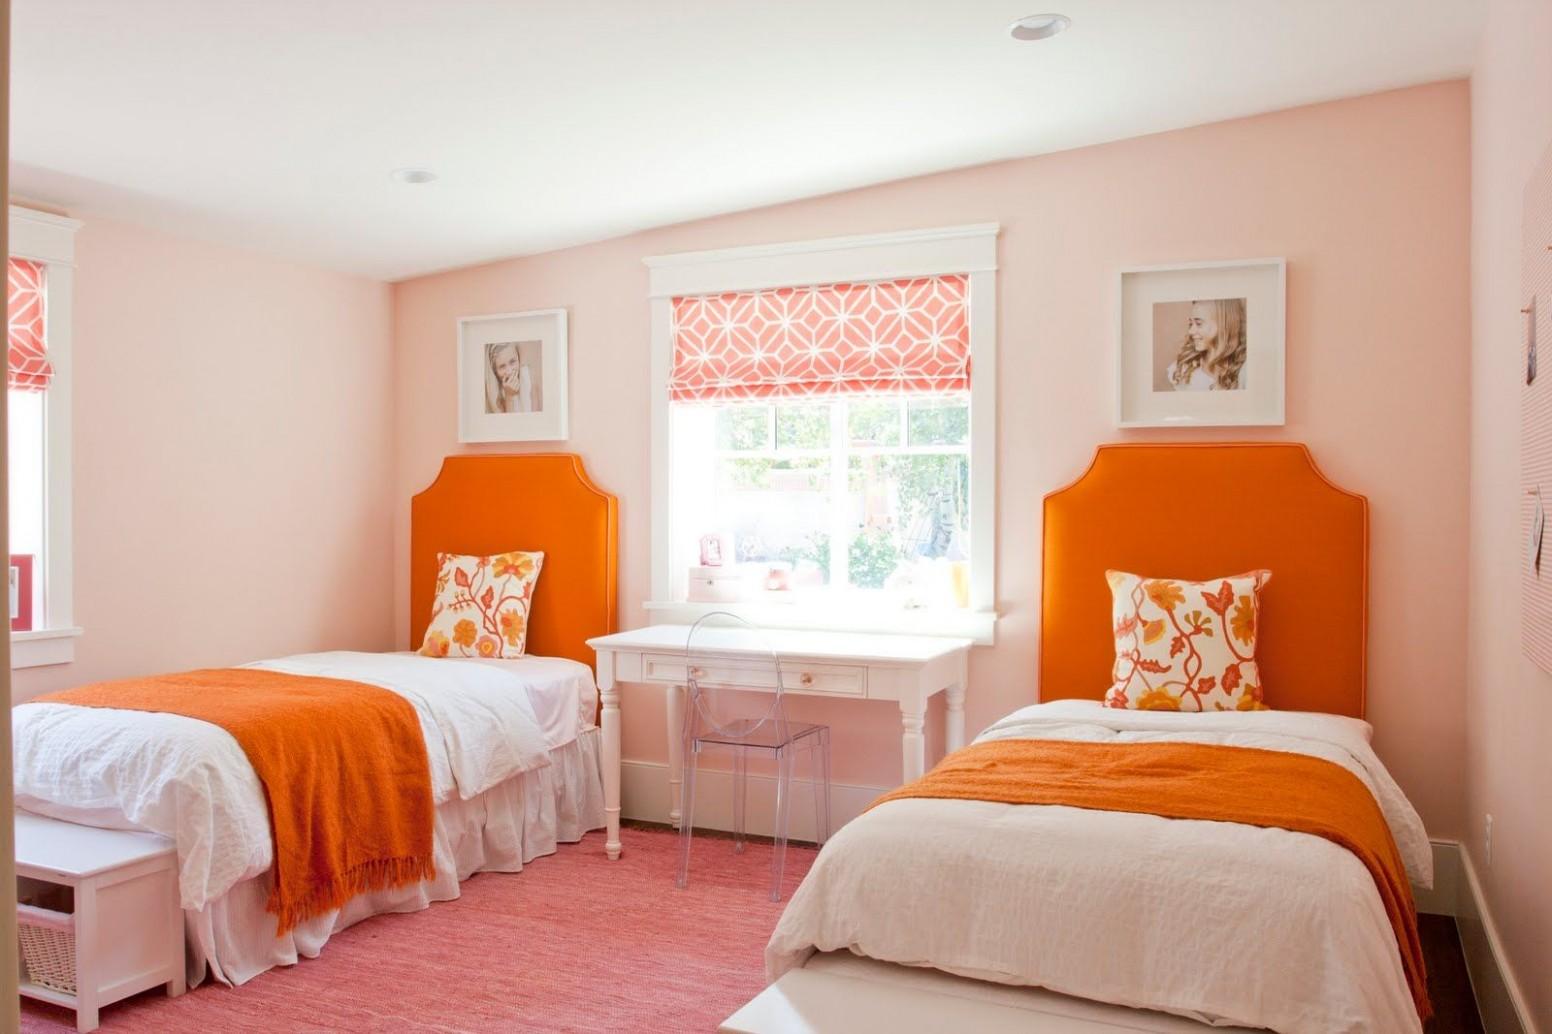 Colors That Make Orange and Compliment Its Tones  Bedroom orange  - Bedroom Ideas Orange